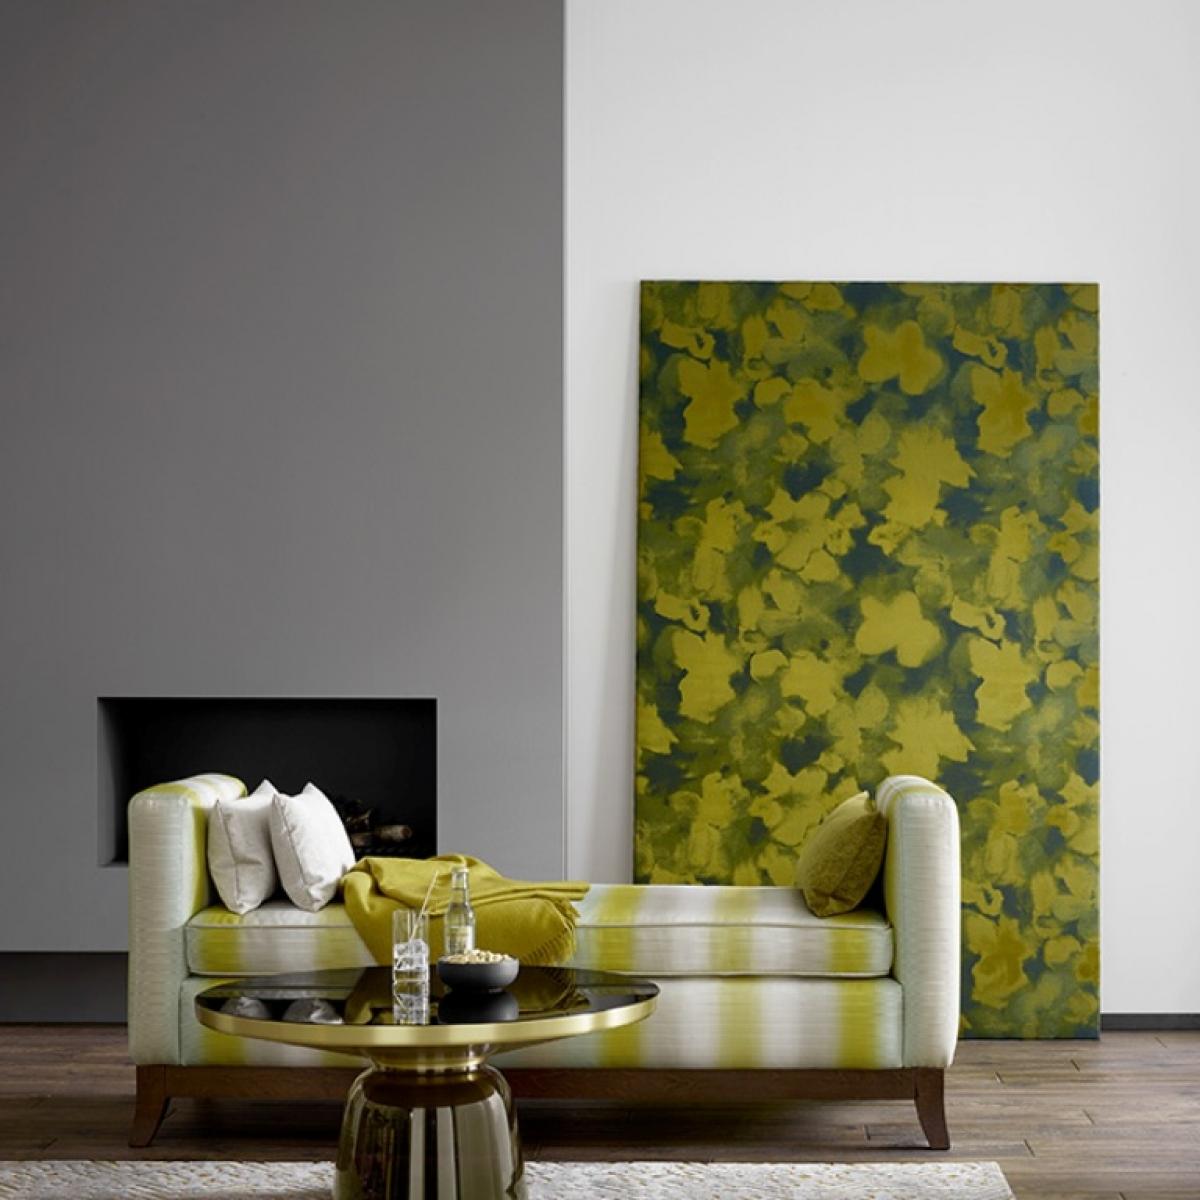 neuheiten raumausstatter with ft sohn dortmund. Black Bedroom Furniture Sets. Home Design Ideas